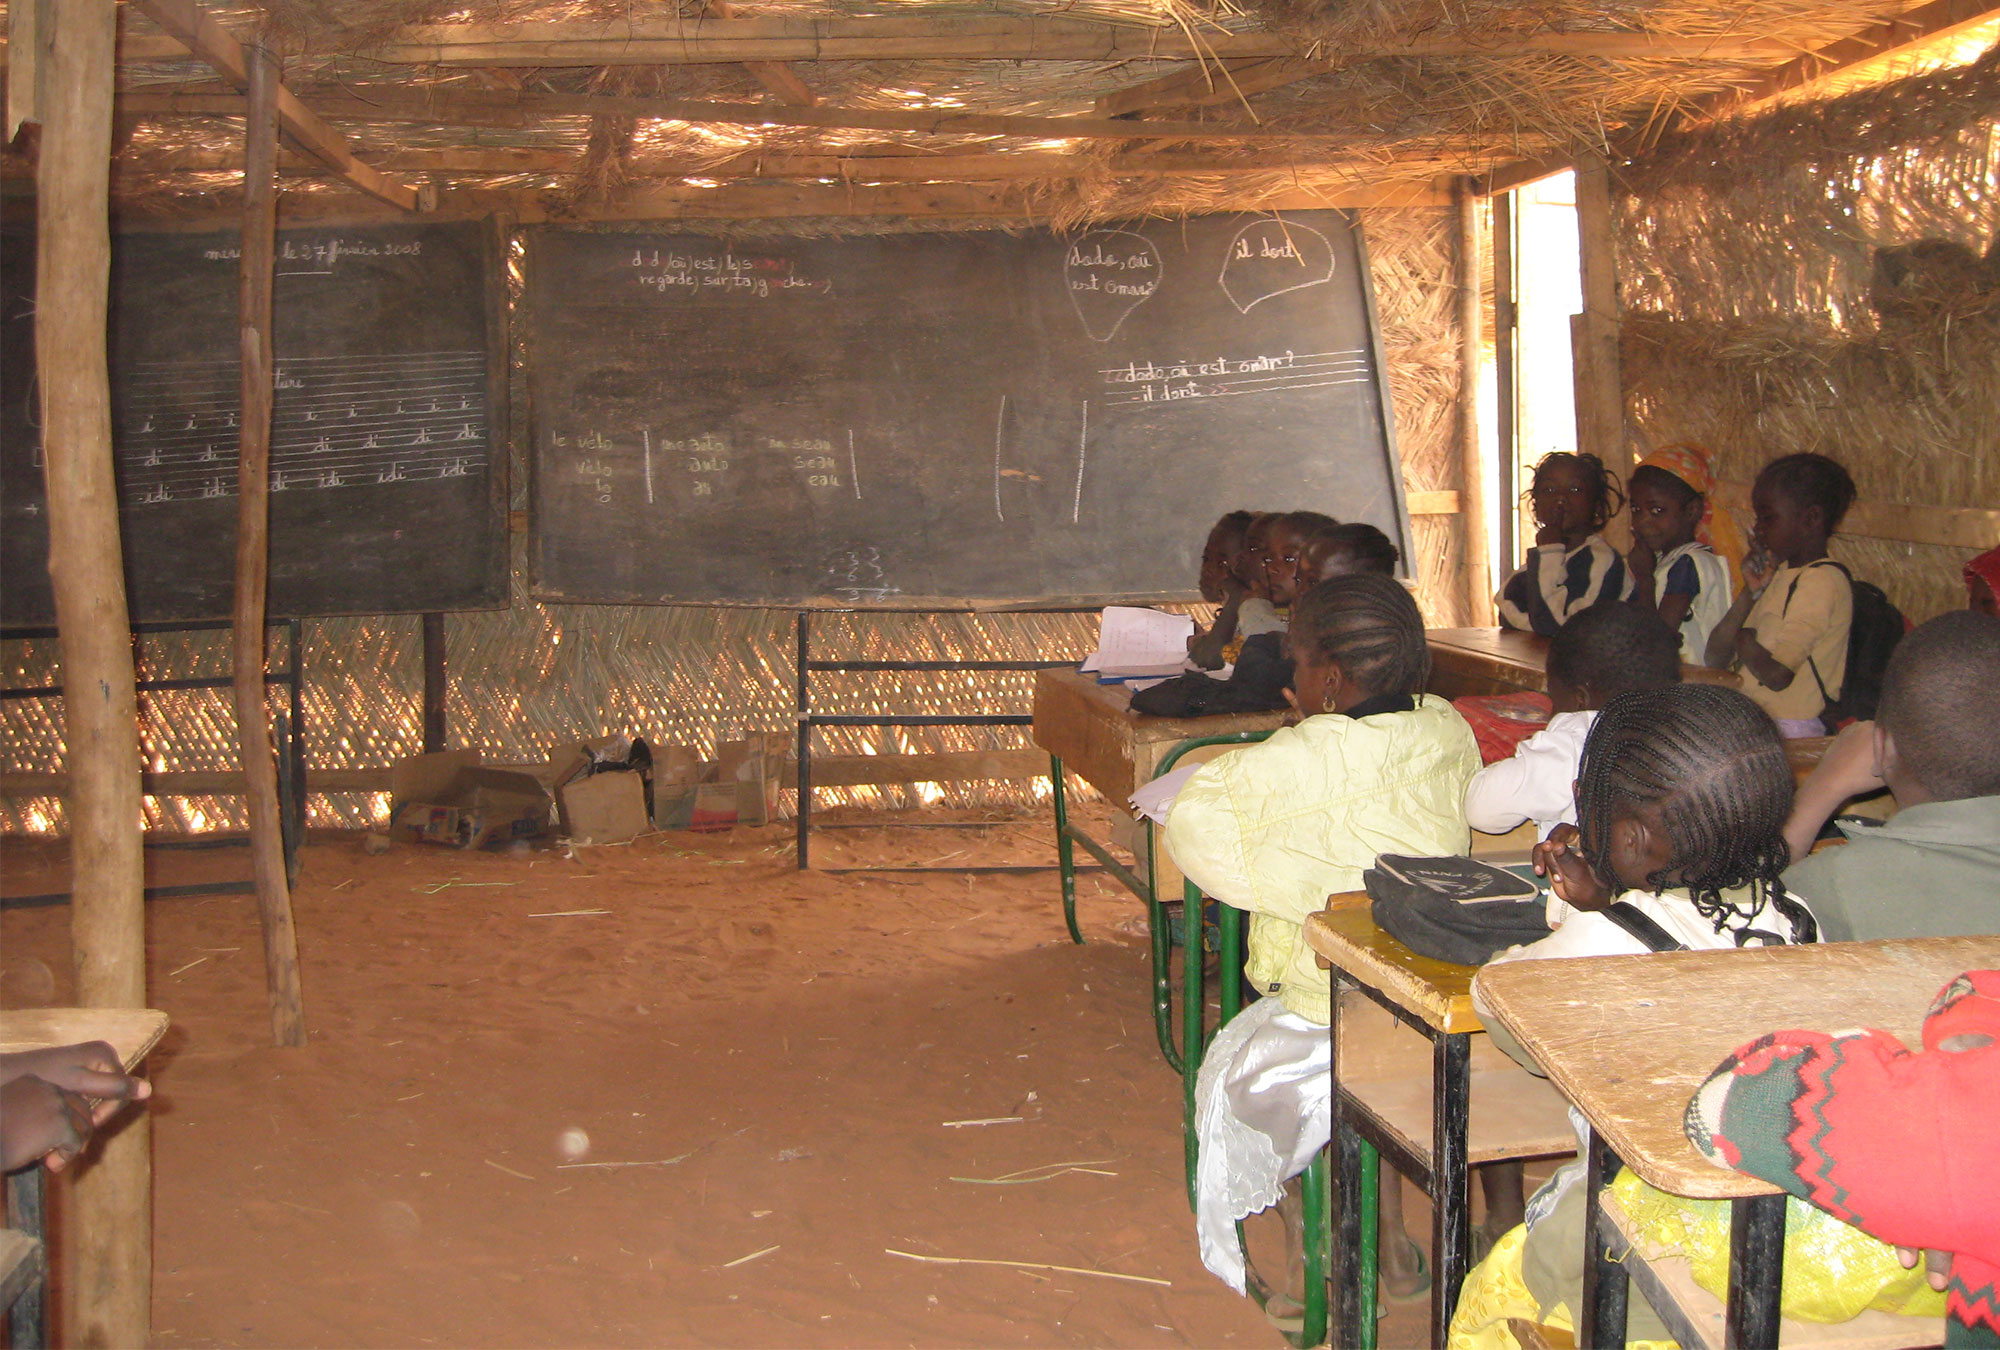 Children in classroom with blackboard